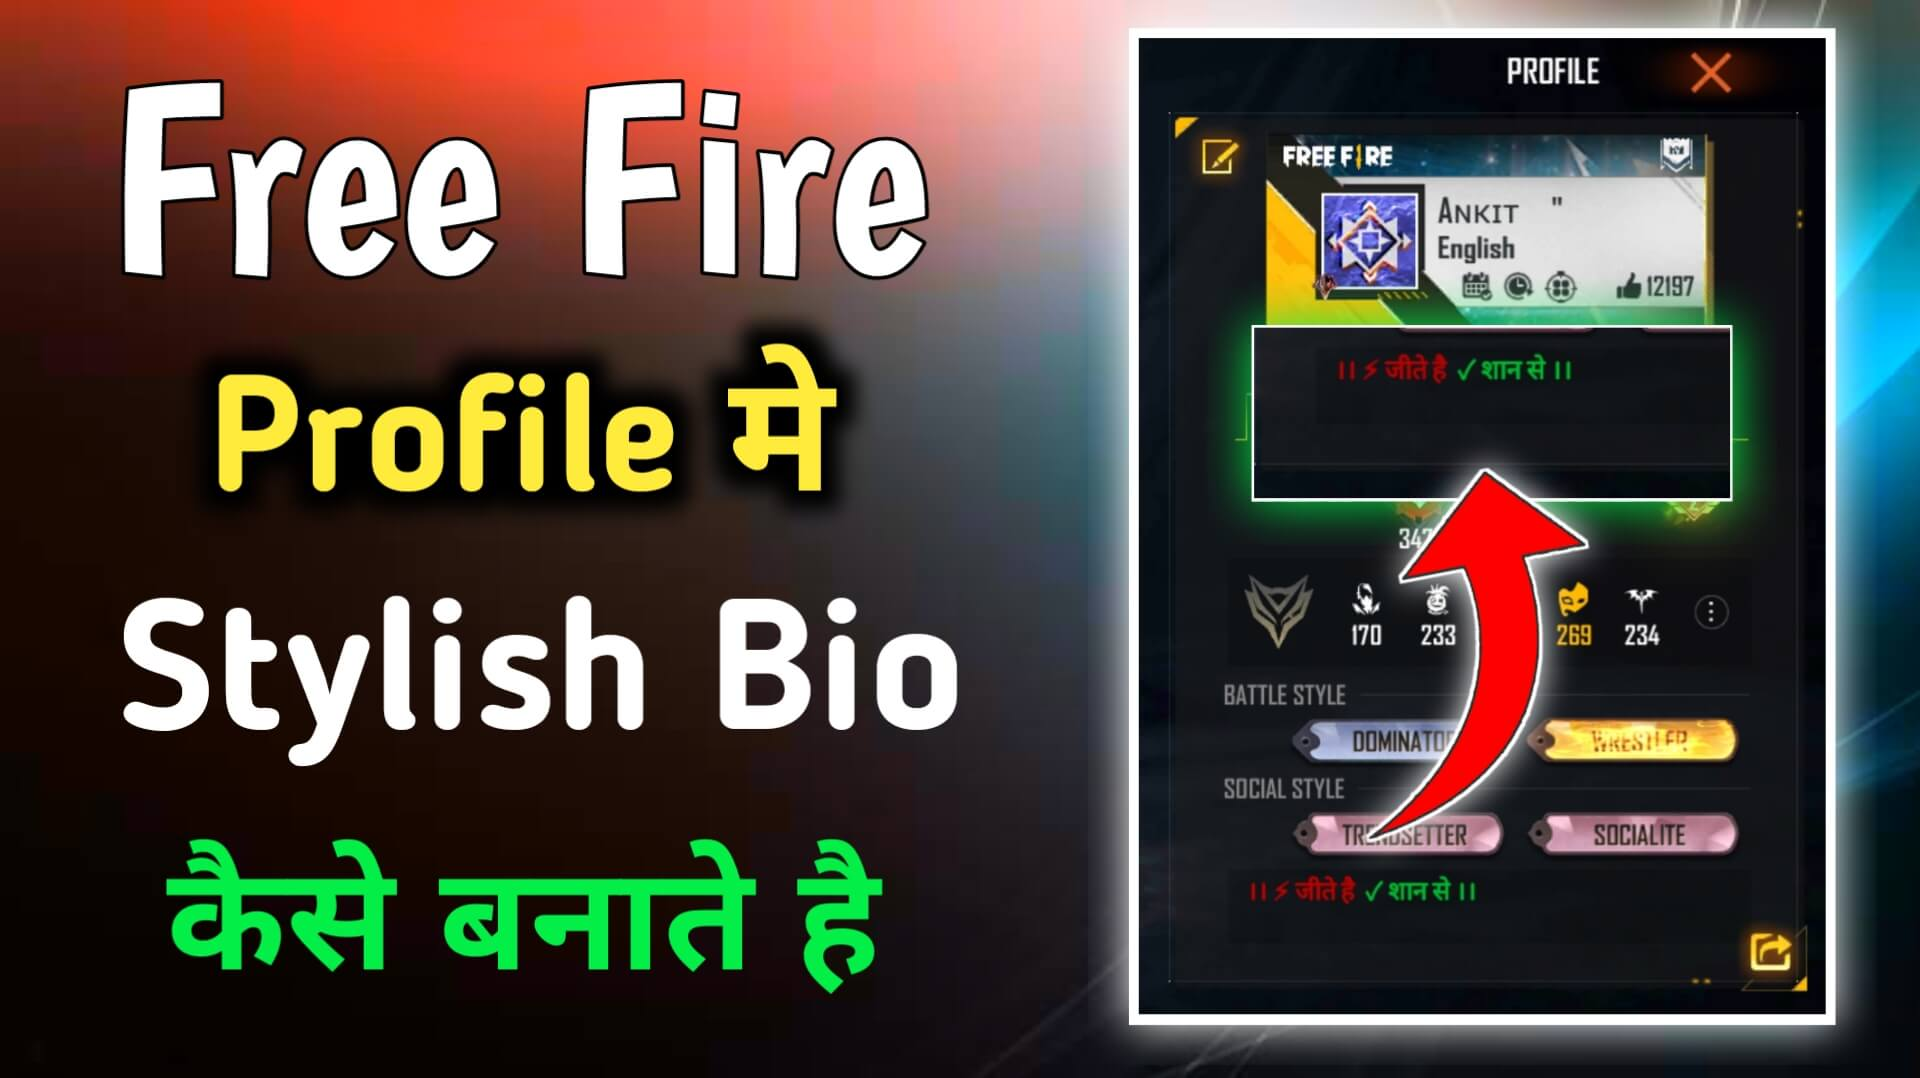 Free Fire Bio